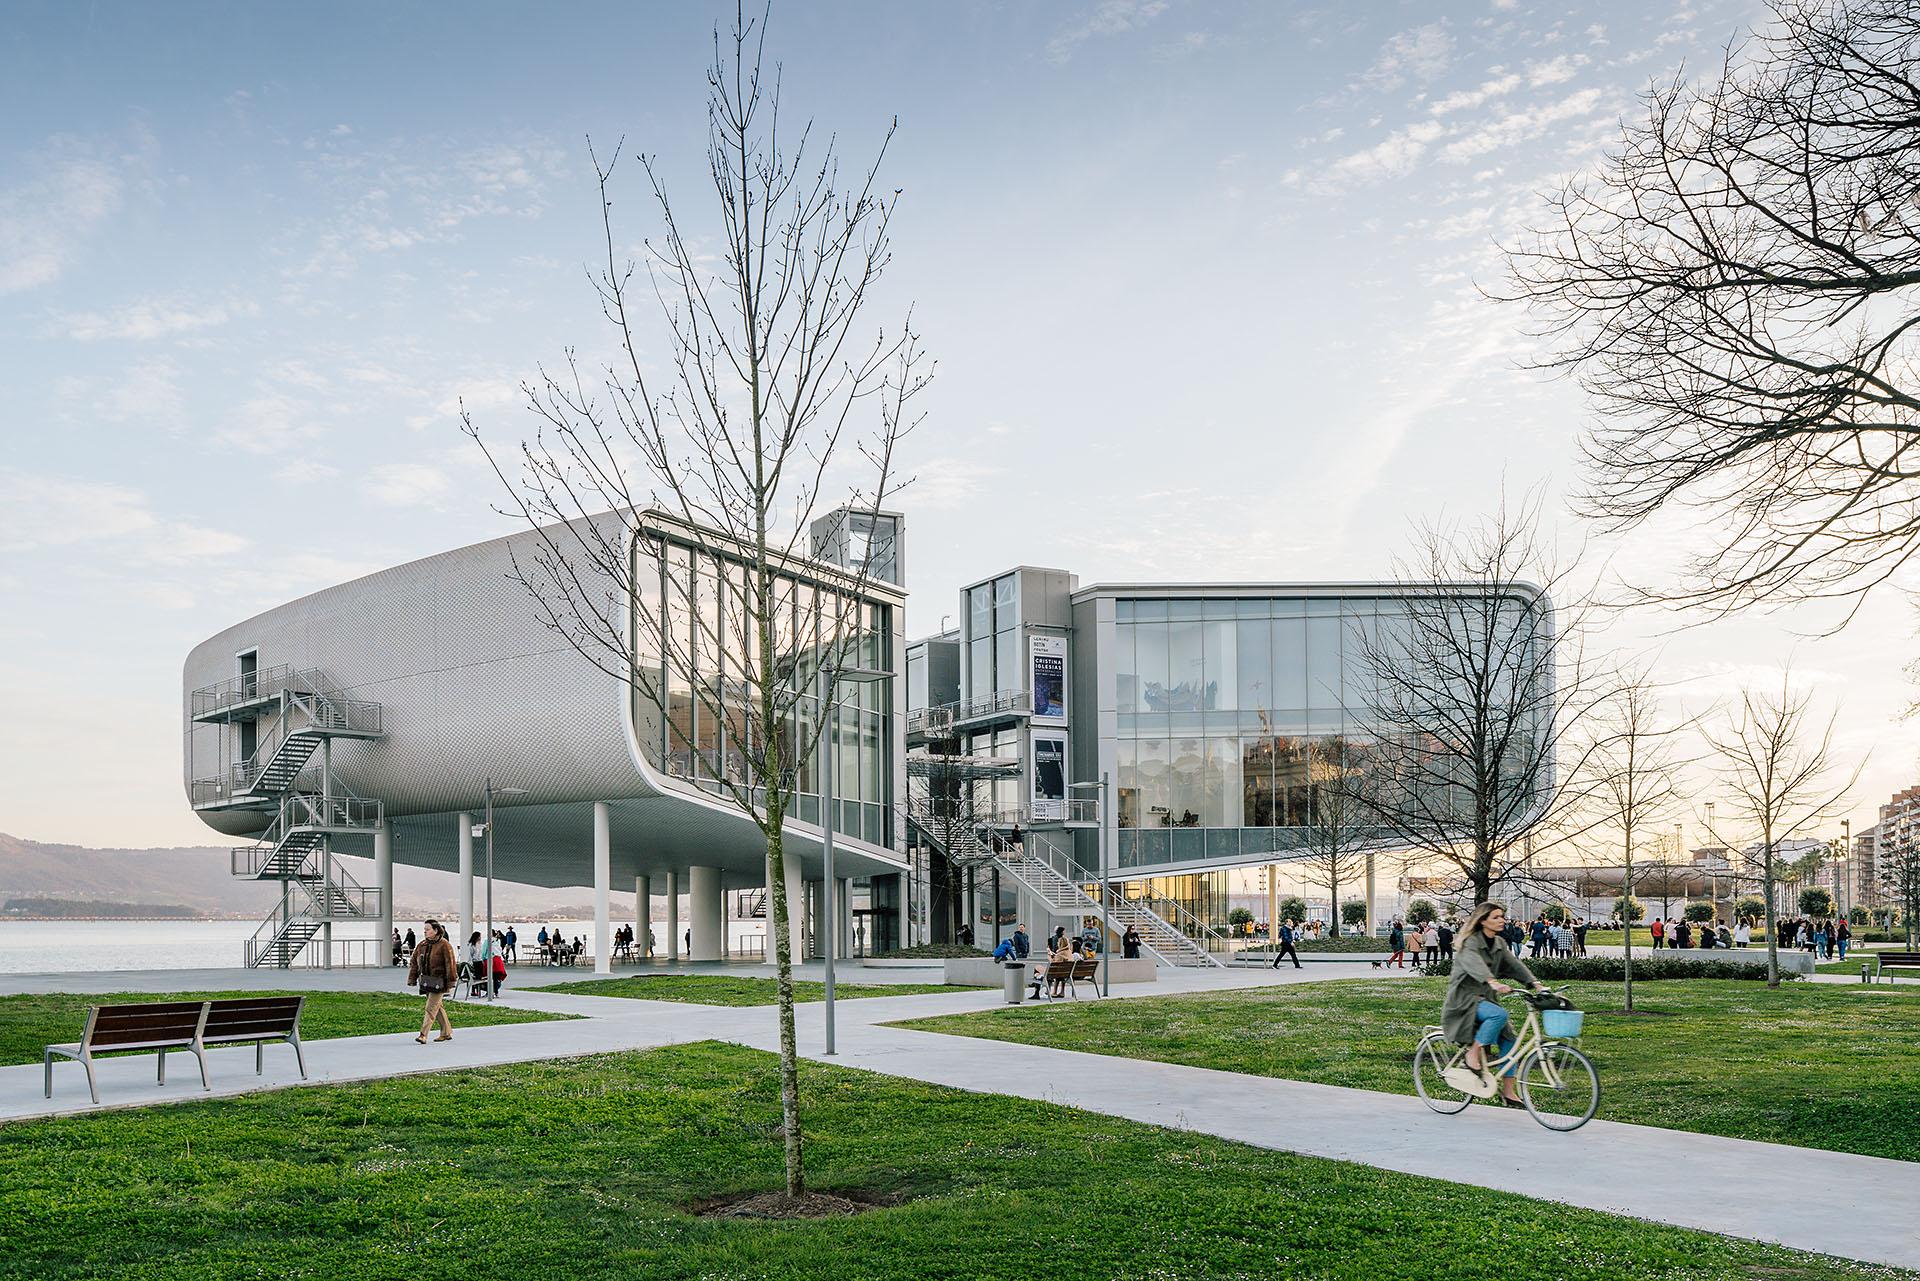 Centro Botín. Fundación Botín- Arquitecto Renzo Piano, Santander 2018